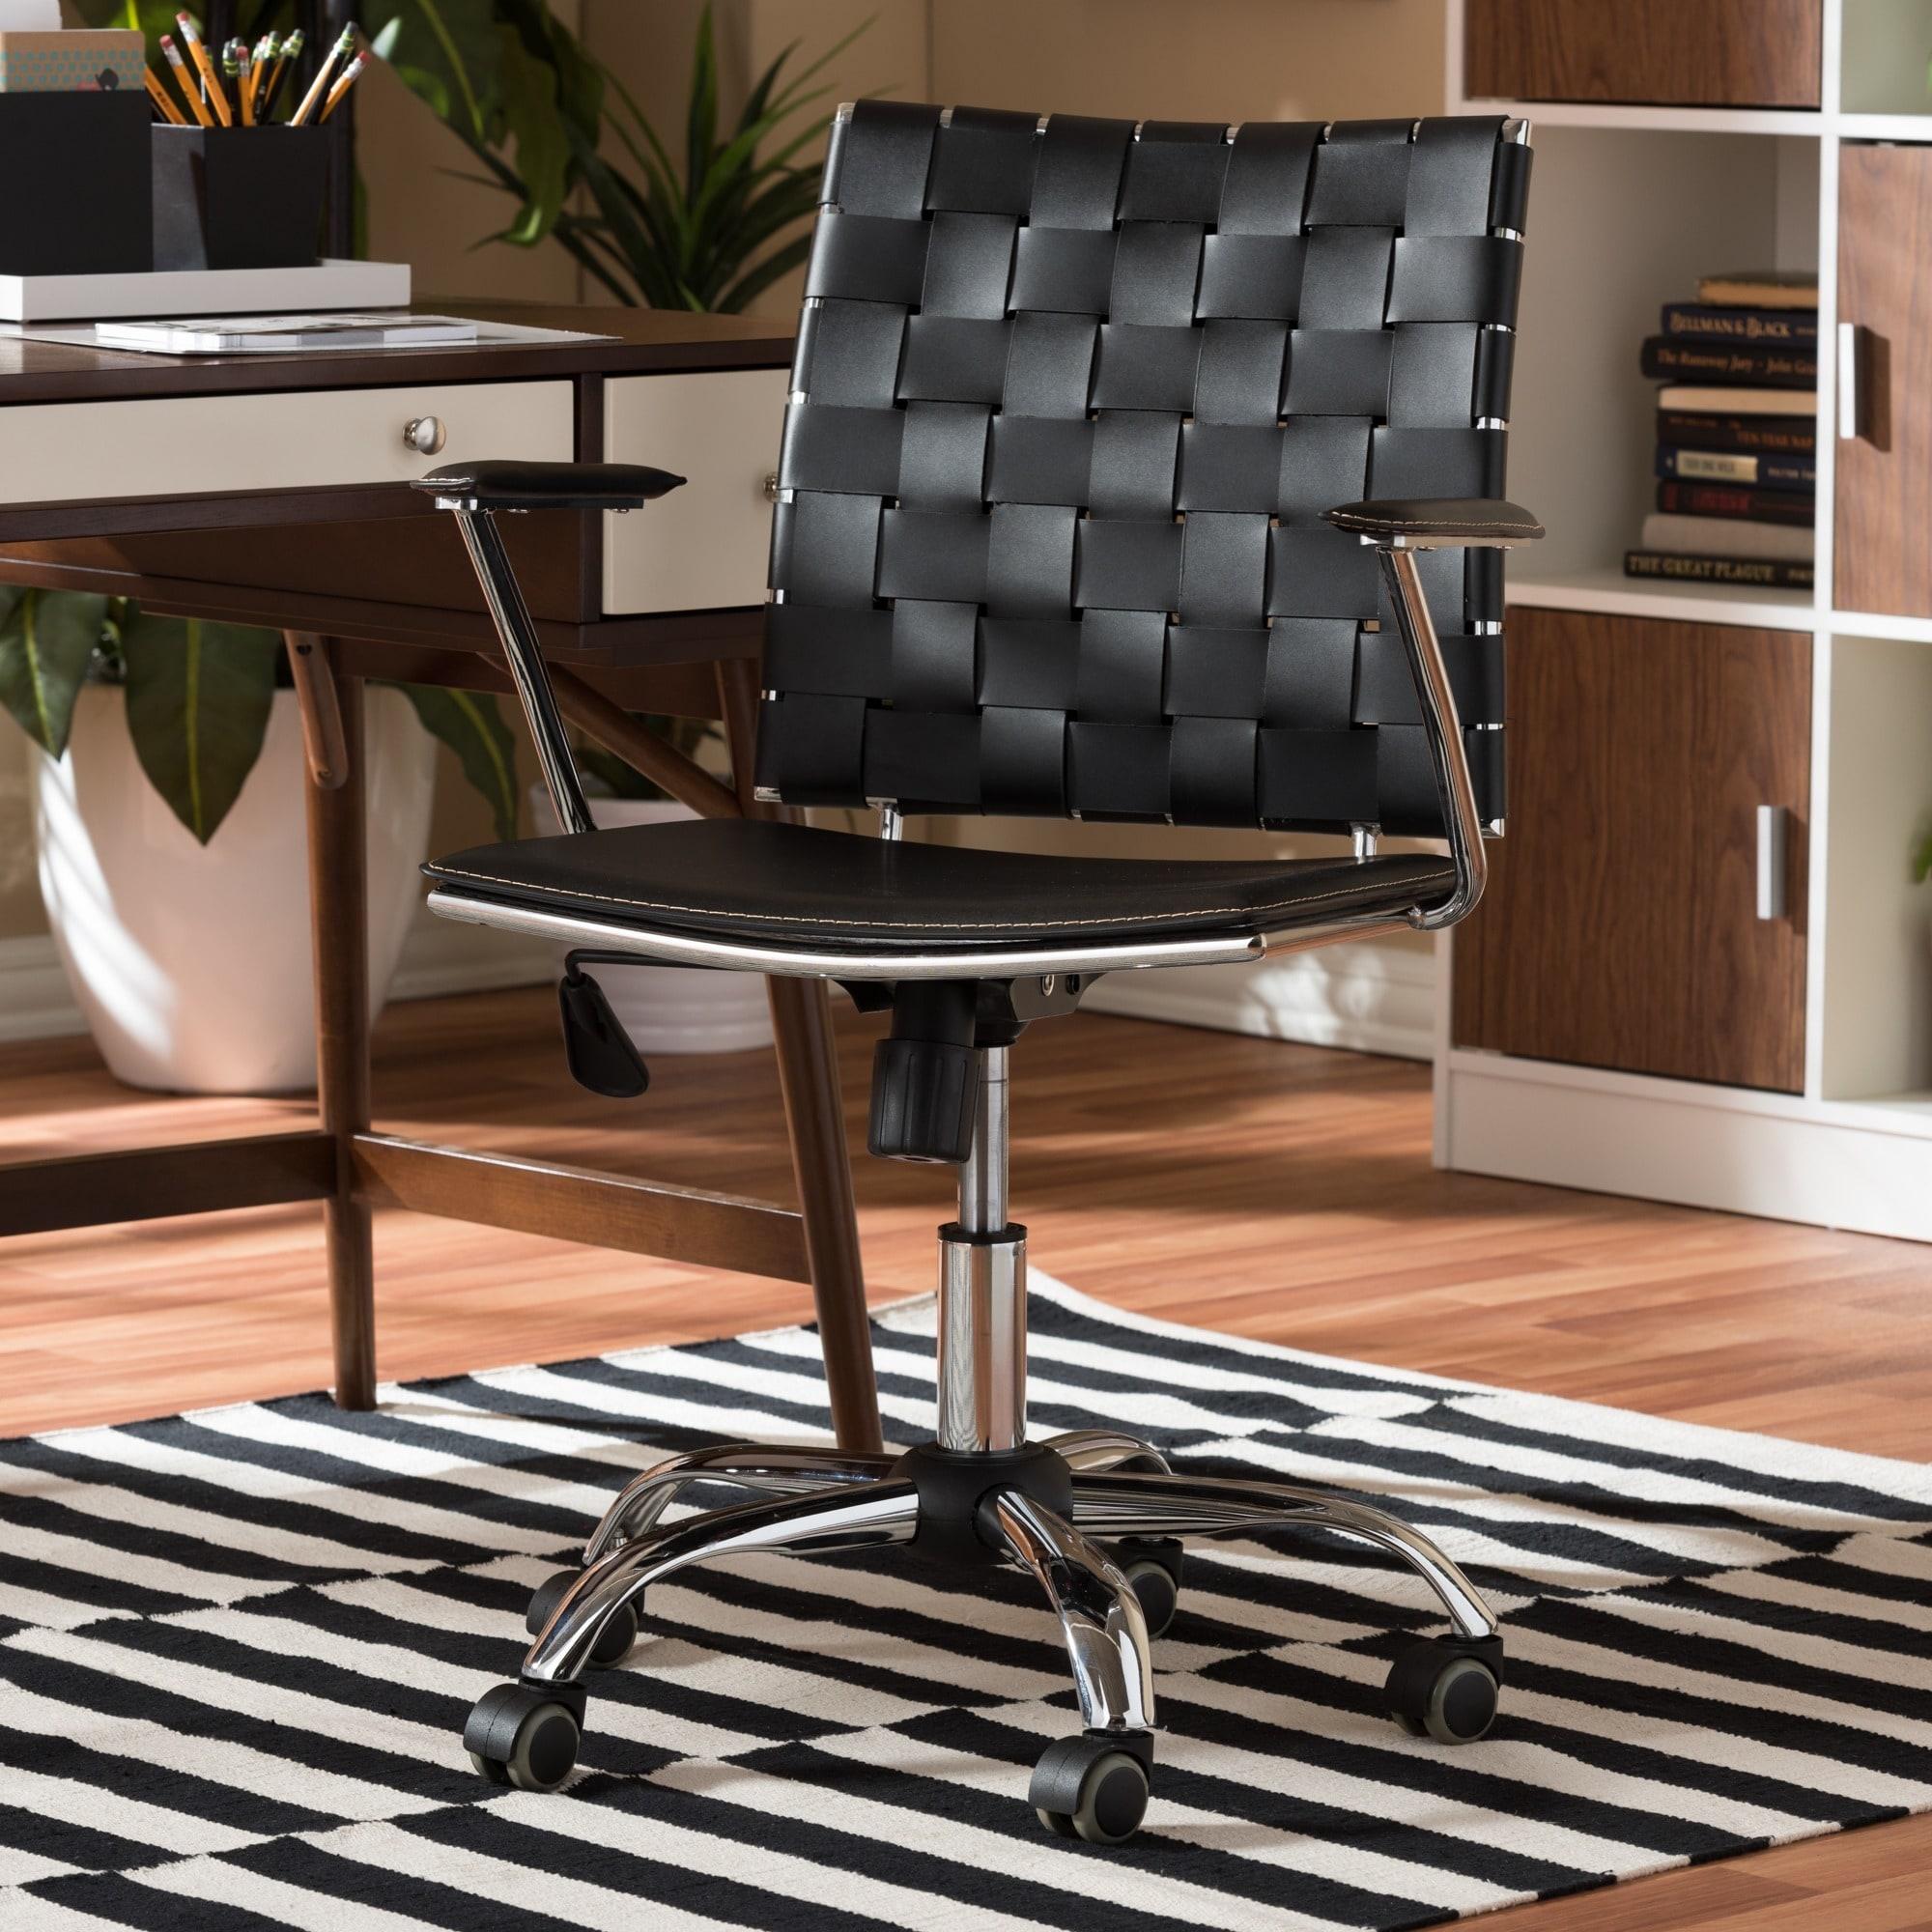 Astonishing Baxton Studio Vittoria Black Leather Modern Office Chair Interior Design Ideas Gentotryabchikinfo